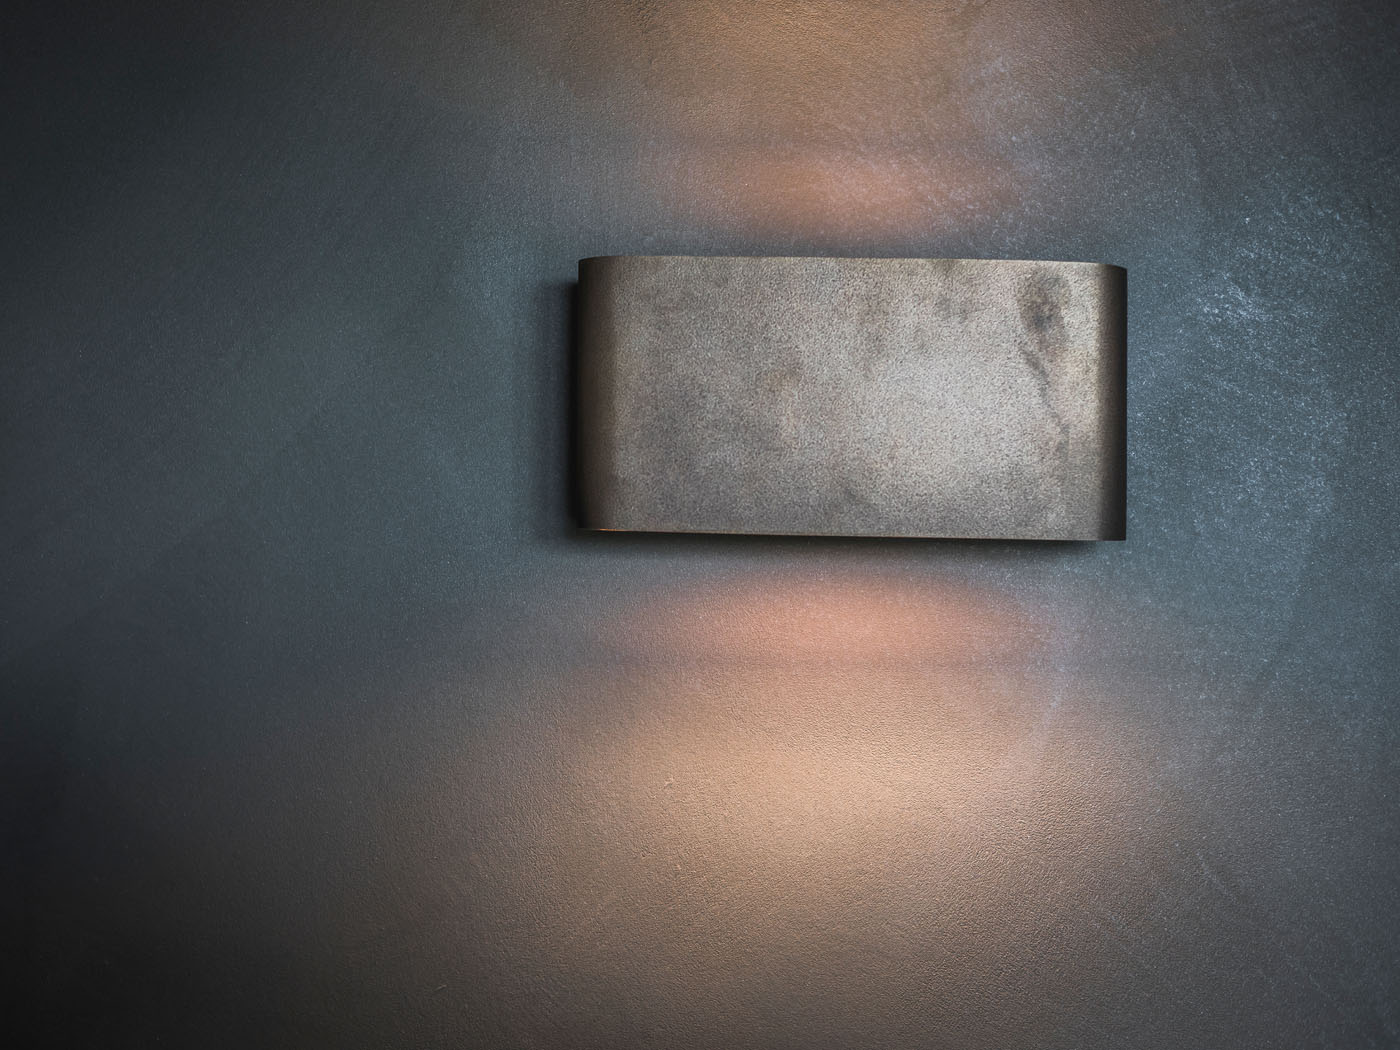 Smell of Metal stucwerk close up